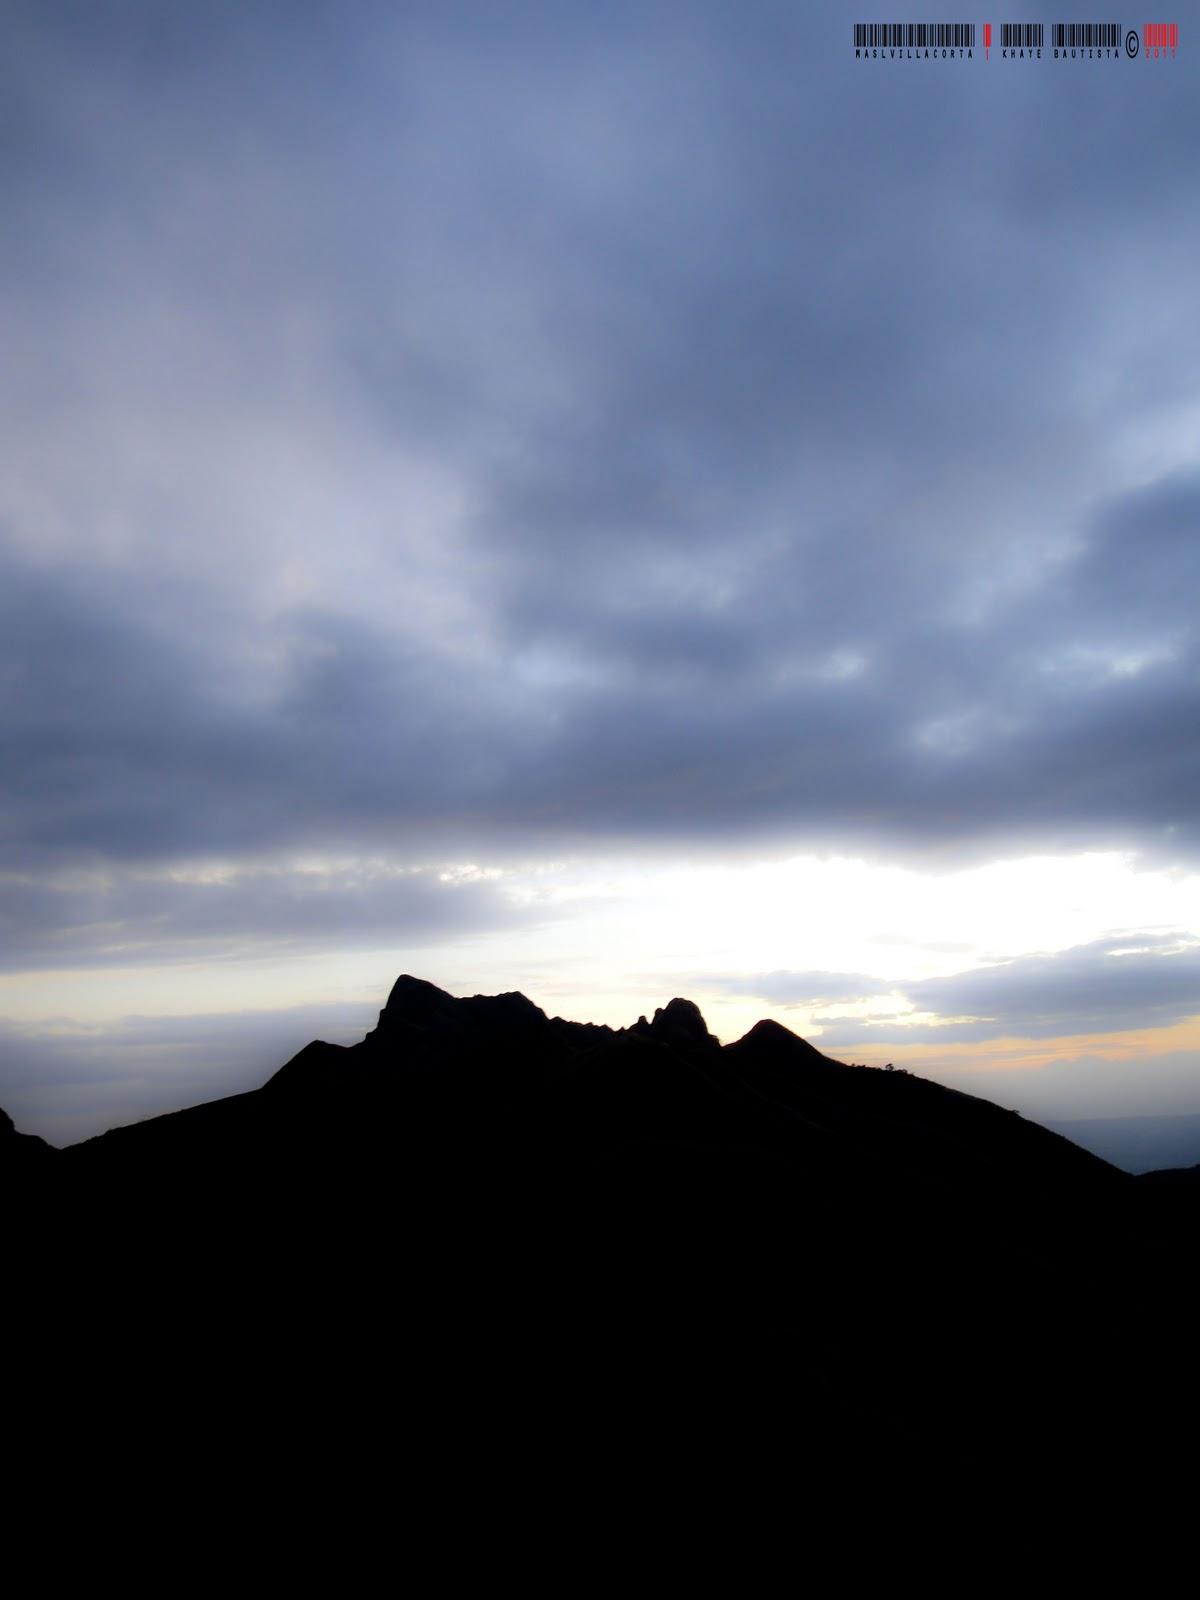 (New trail view. We clocked 45mins from JOP from Mahogany Bulalo Galore from Mt. Talamitam so 45mins hiking to reach c& 7 ainu0027t bad) & I Mark